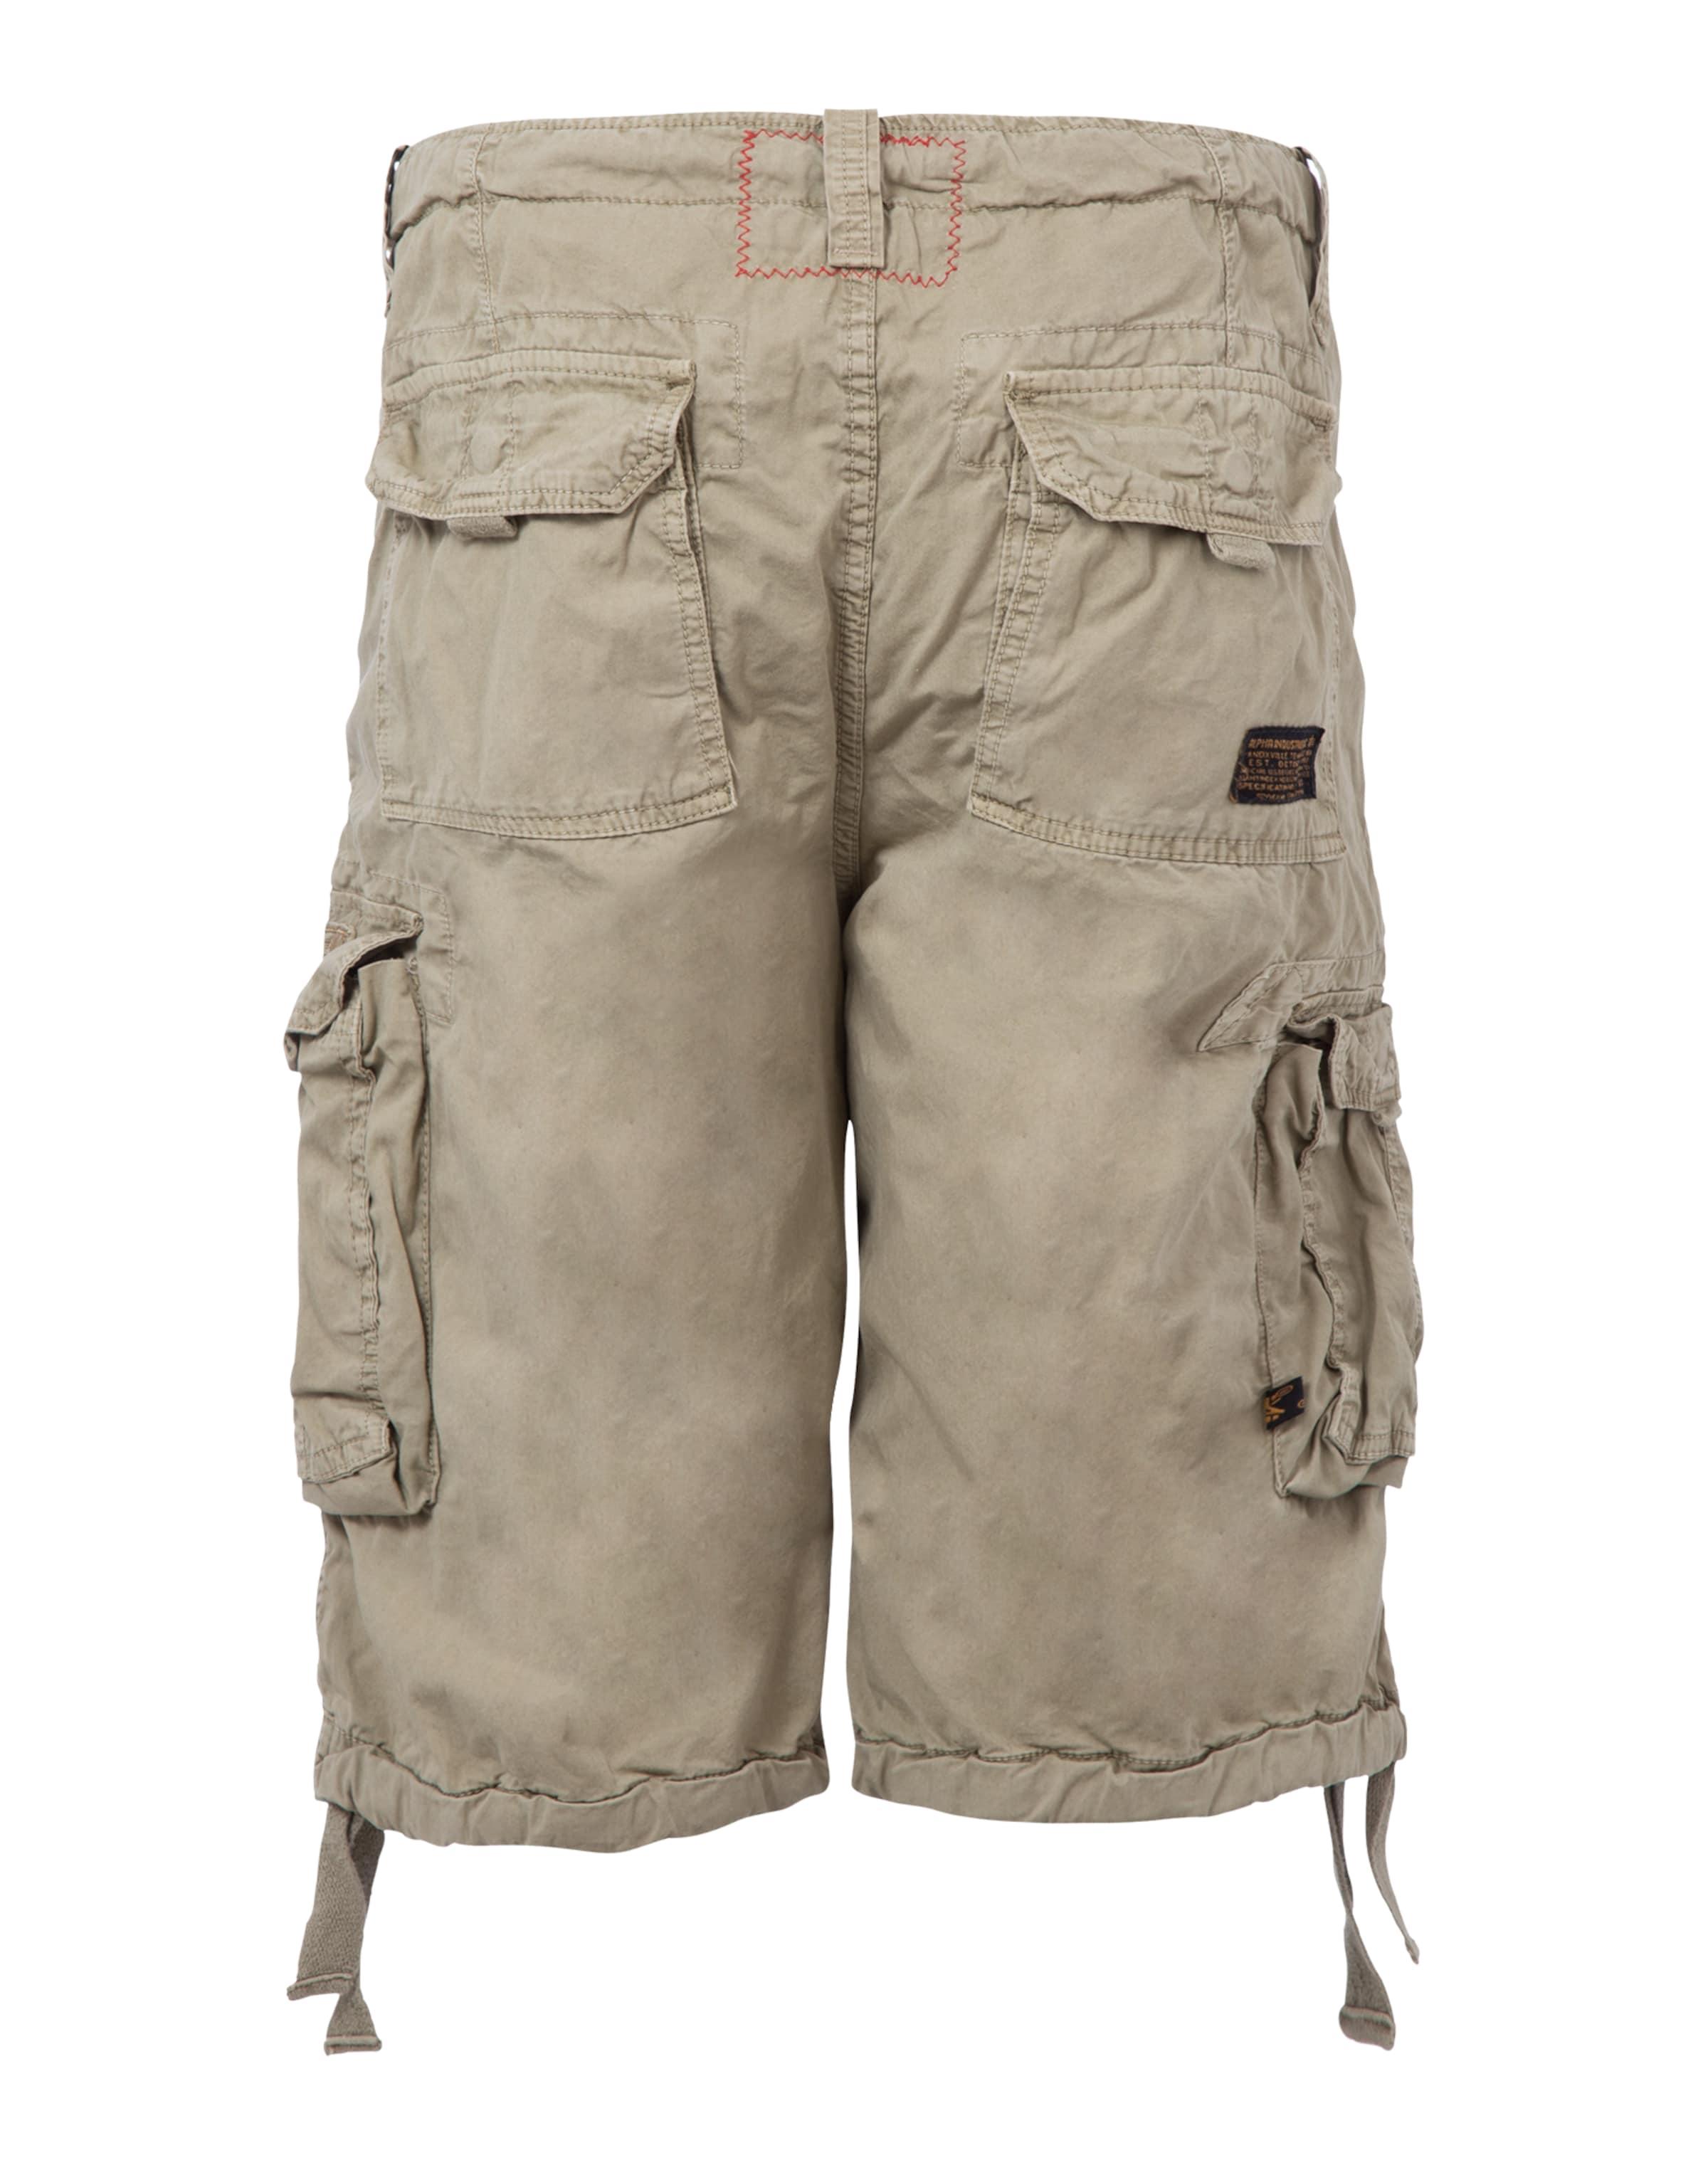 Pantalon En Beige 'jet' Industries Cargo Alpha FJlTcK1